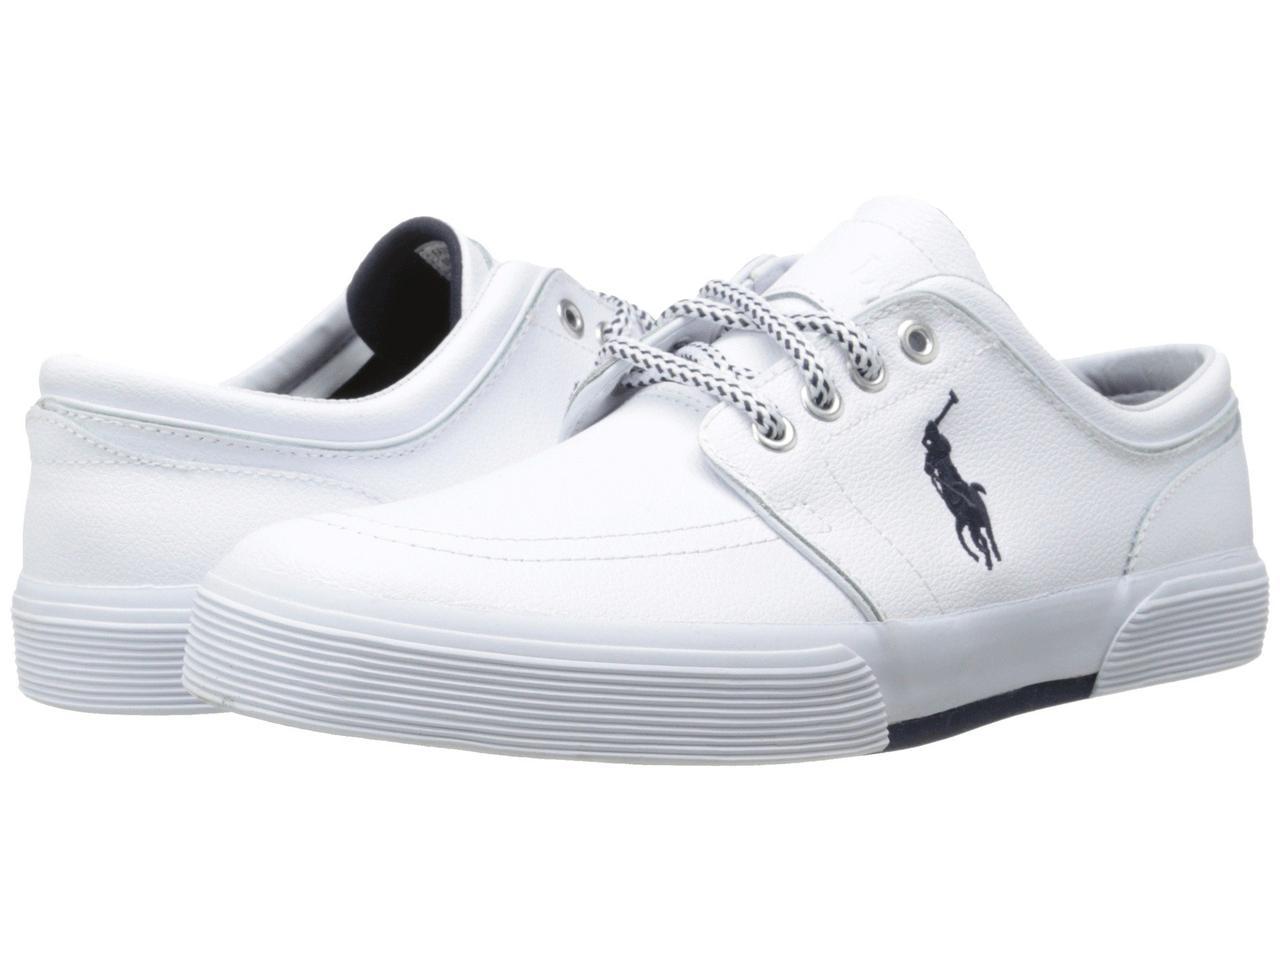 Кроссовки/Кеды (Оригинал) Polo Ralph Lauren Faxon Low White Sport Leather